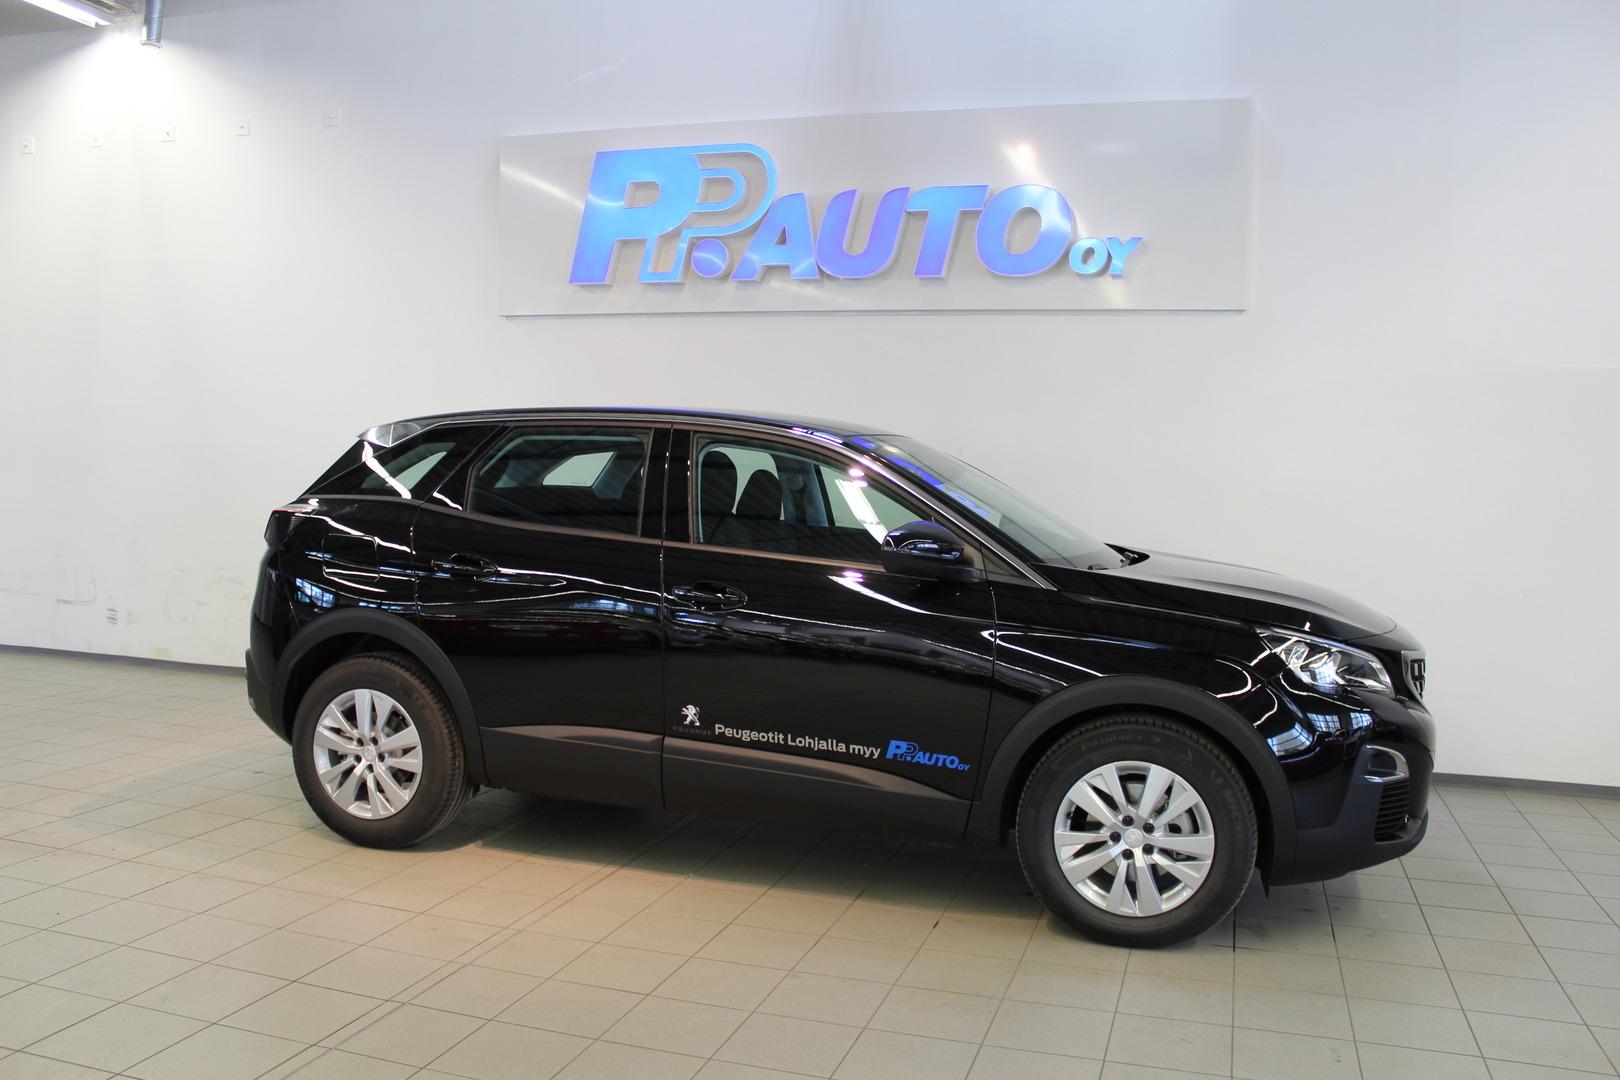 Peugeot Suv 3008 >> Vaihtoautot Peugeot 3008 Active Puretech 130 Eat8 Automaatti